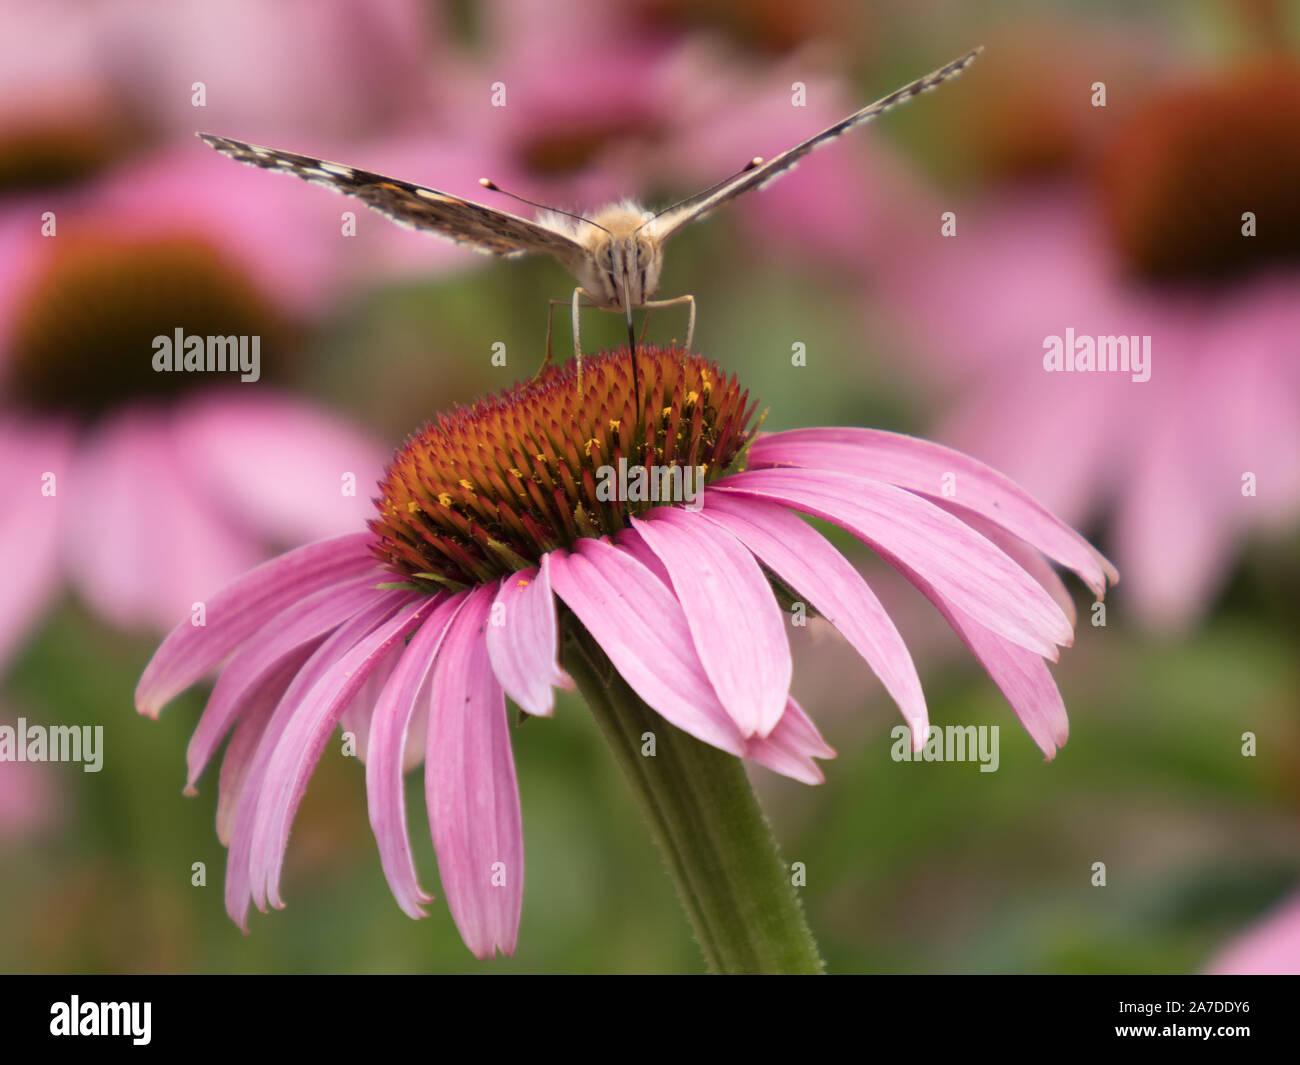 Close-up de un Painted Lady (Vanessa cardui) en la flor de una coneflower Foto de stock